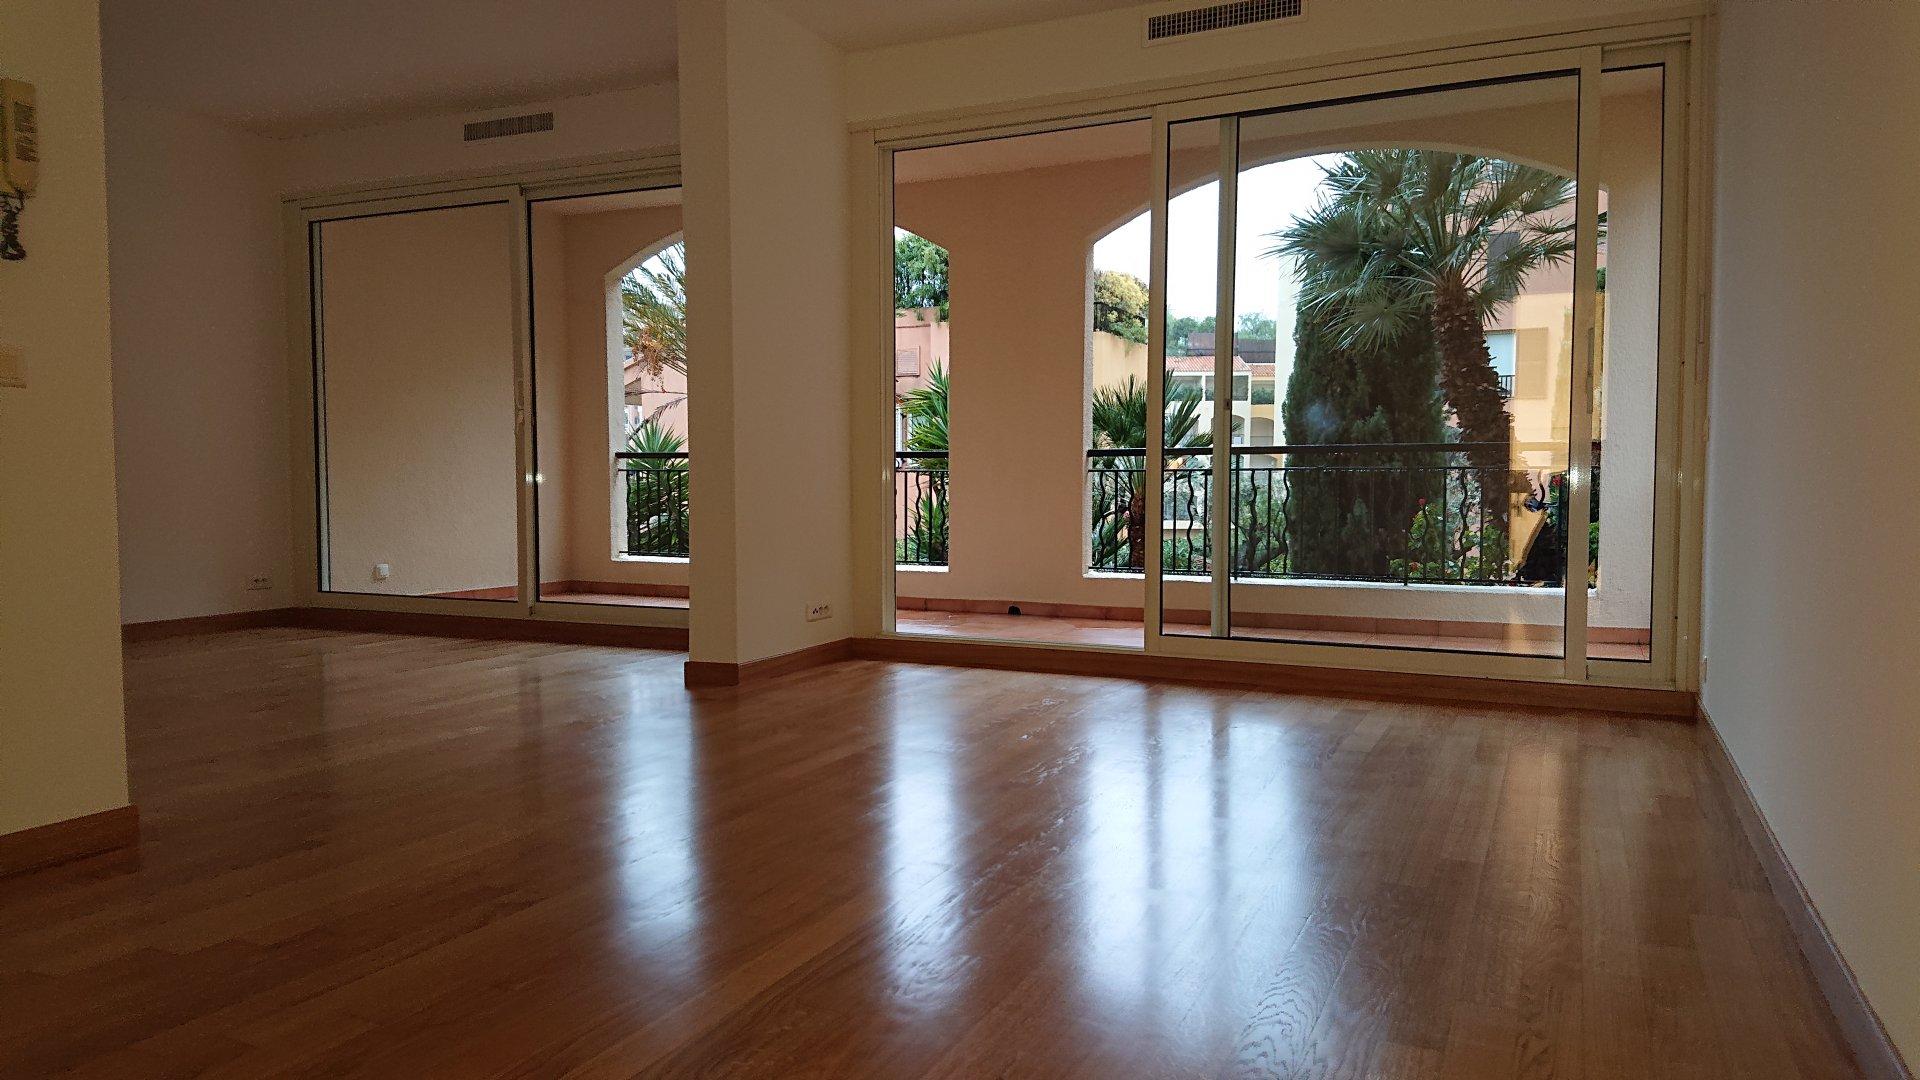 2/3 Rooms apartment Fontvieille